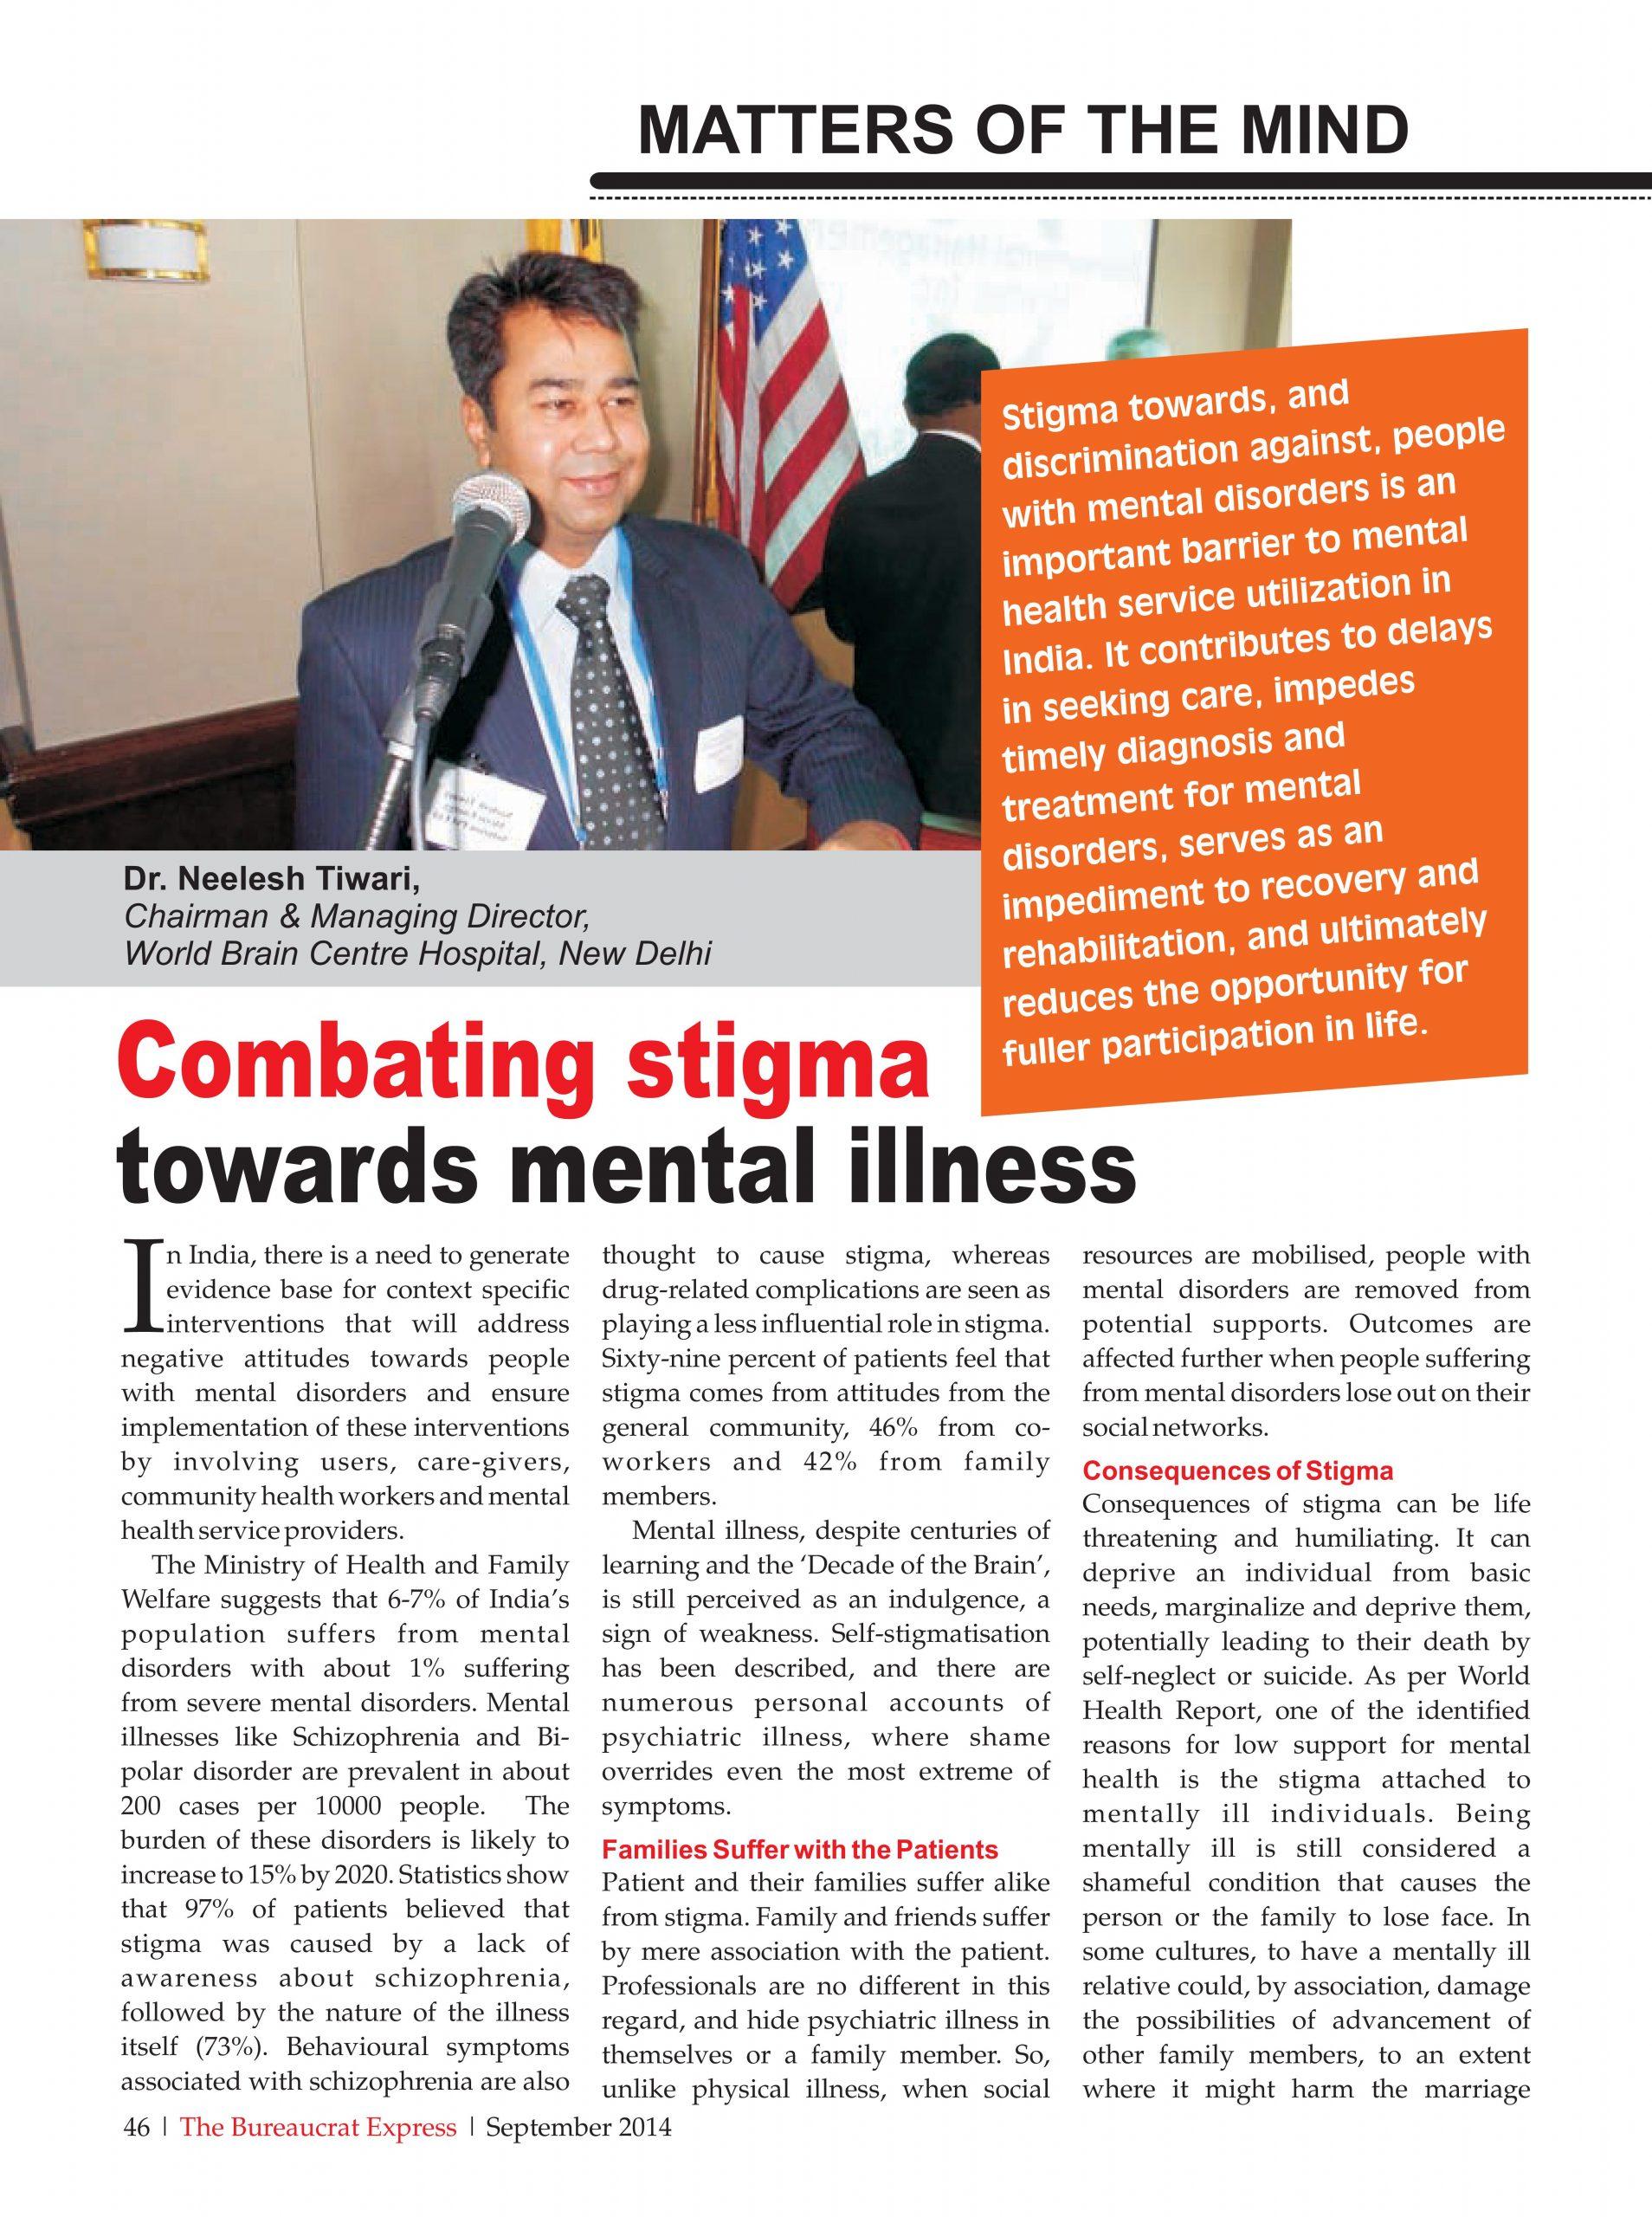 World Brain Center Dr Neelesh Tiwari.JPG4666839World Brain Center Dr Neelesh Tiwari.JPG9_Sep, World Brain Center Dr Neelesh Tiwari.JPG4